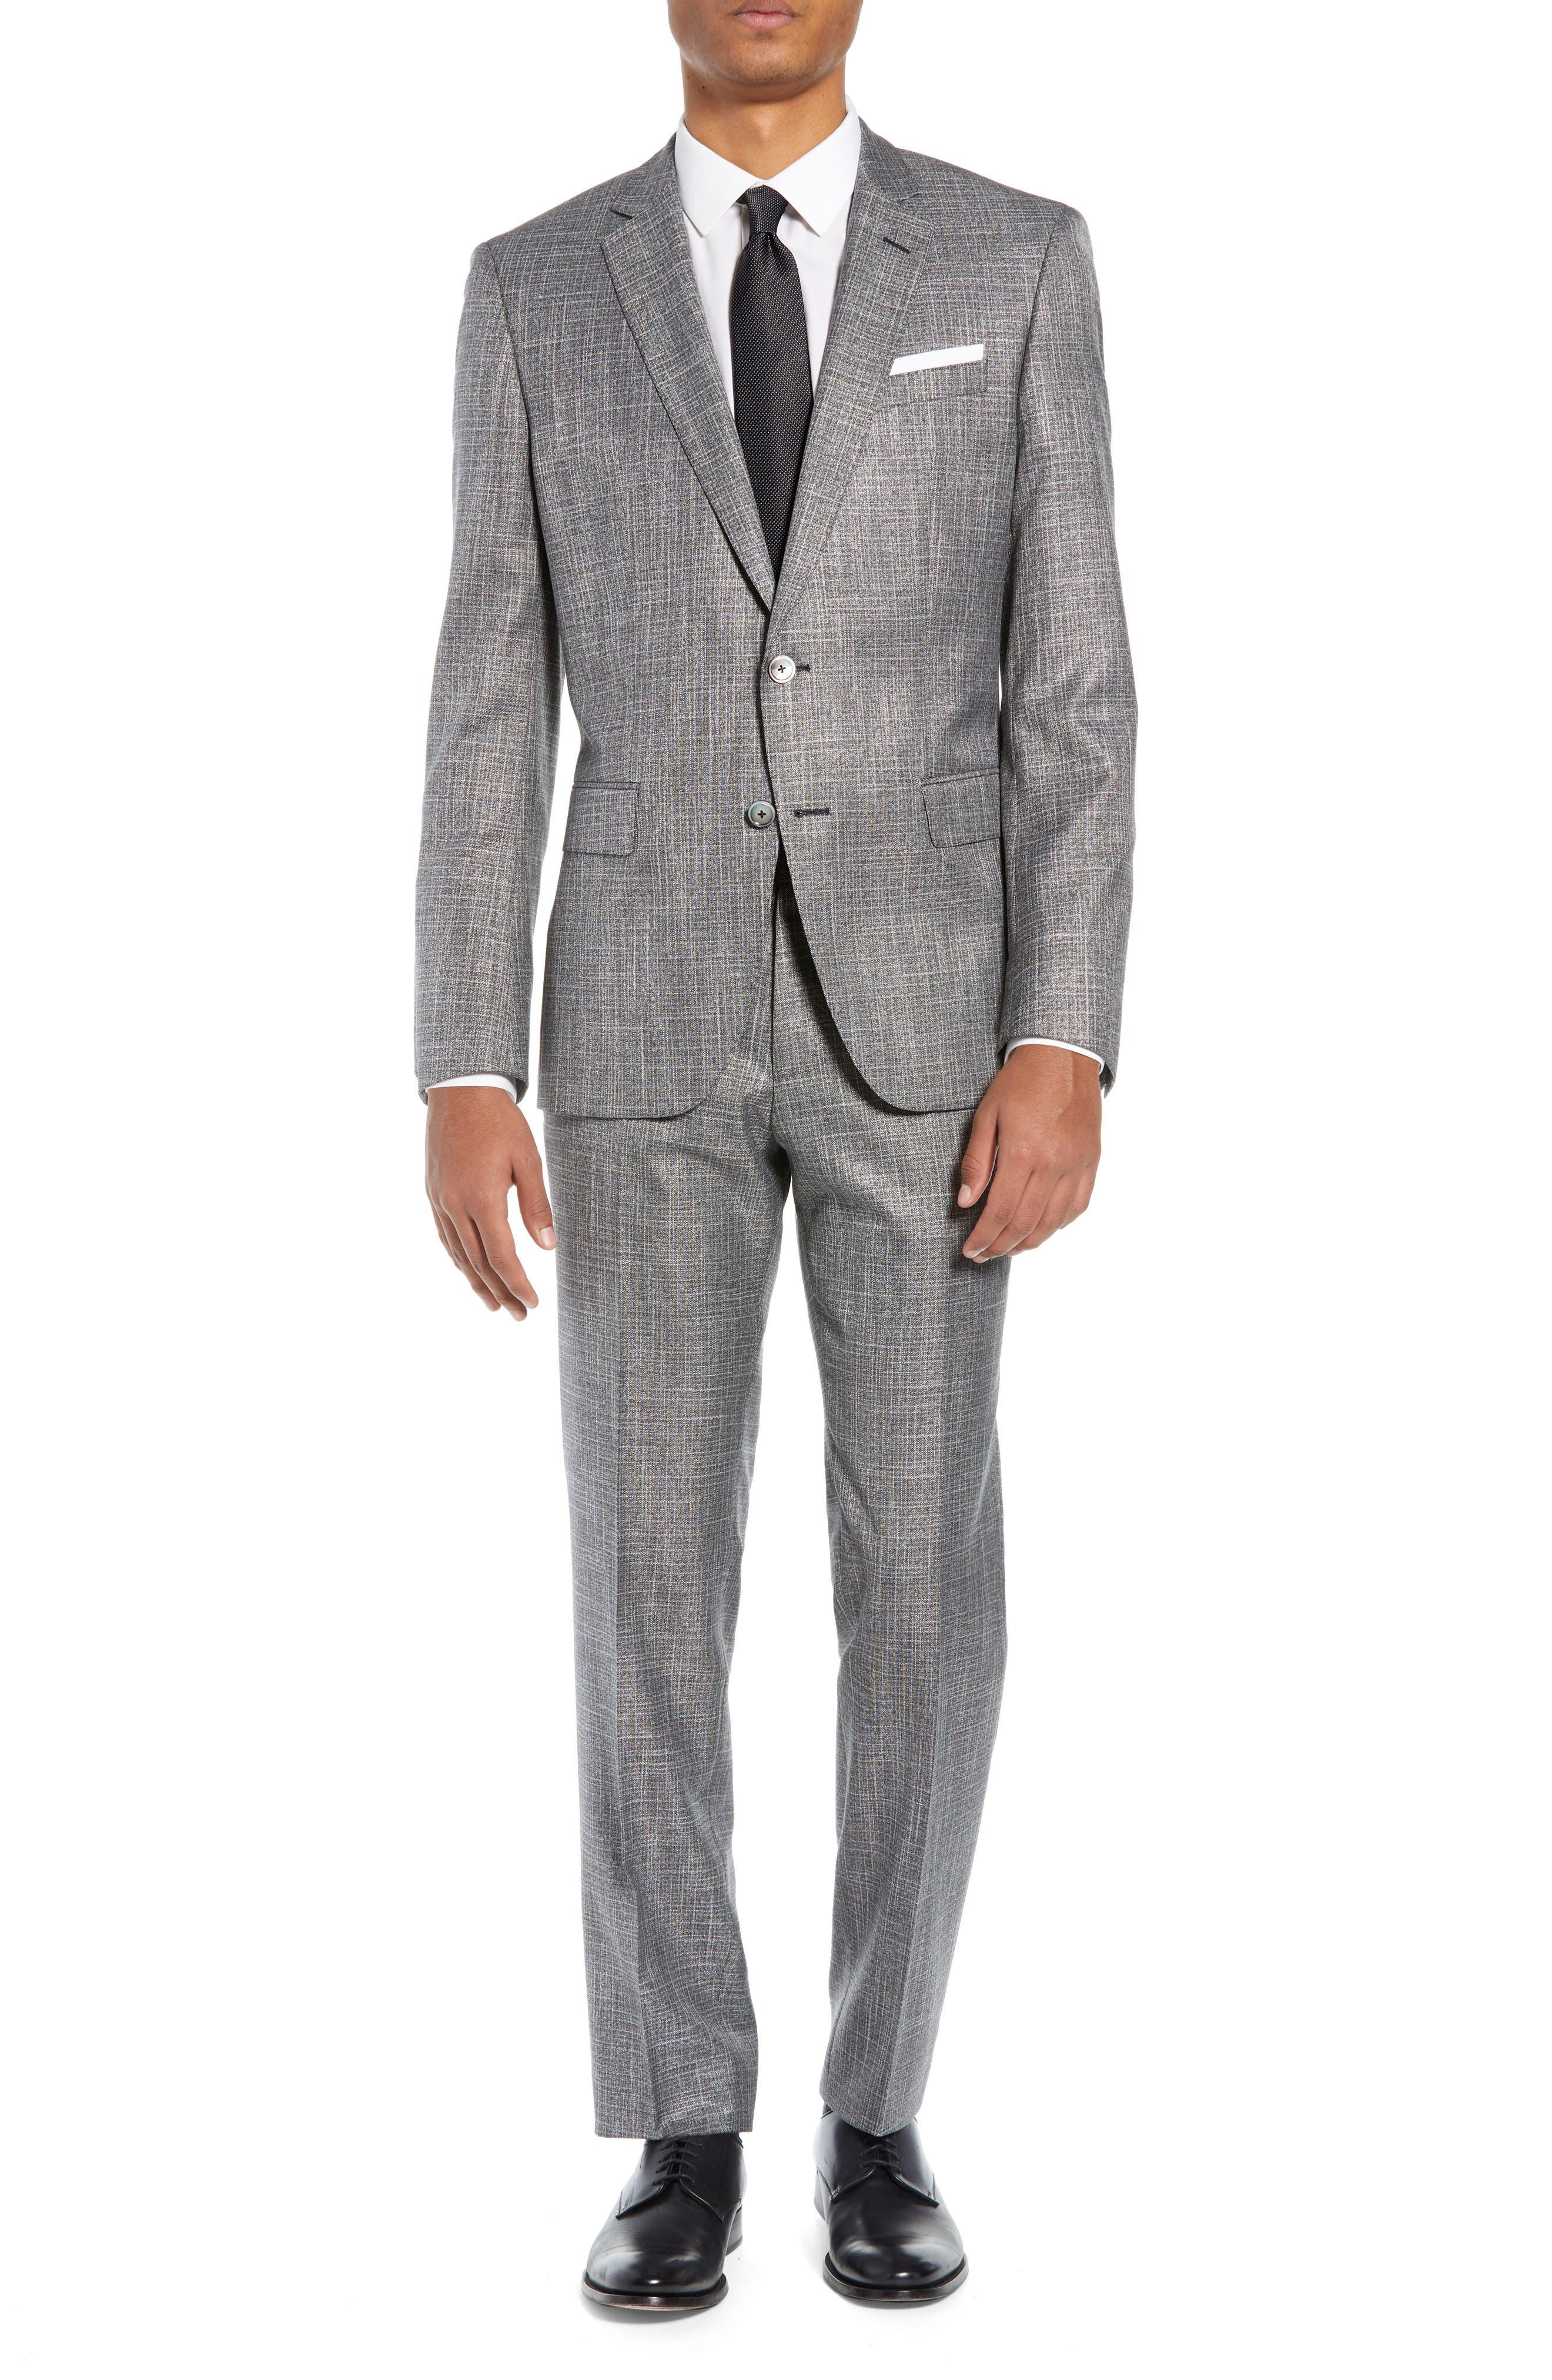 Hutson/Gander Trim Fit Solid Wool Blend Suit, Main, color, MEDIUM GREY